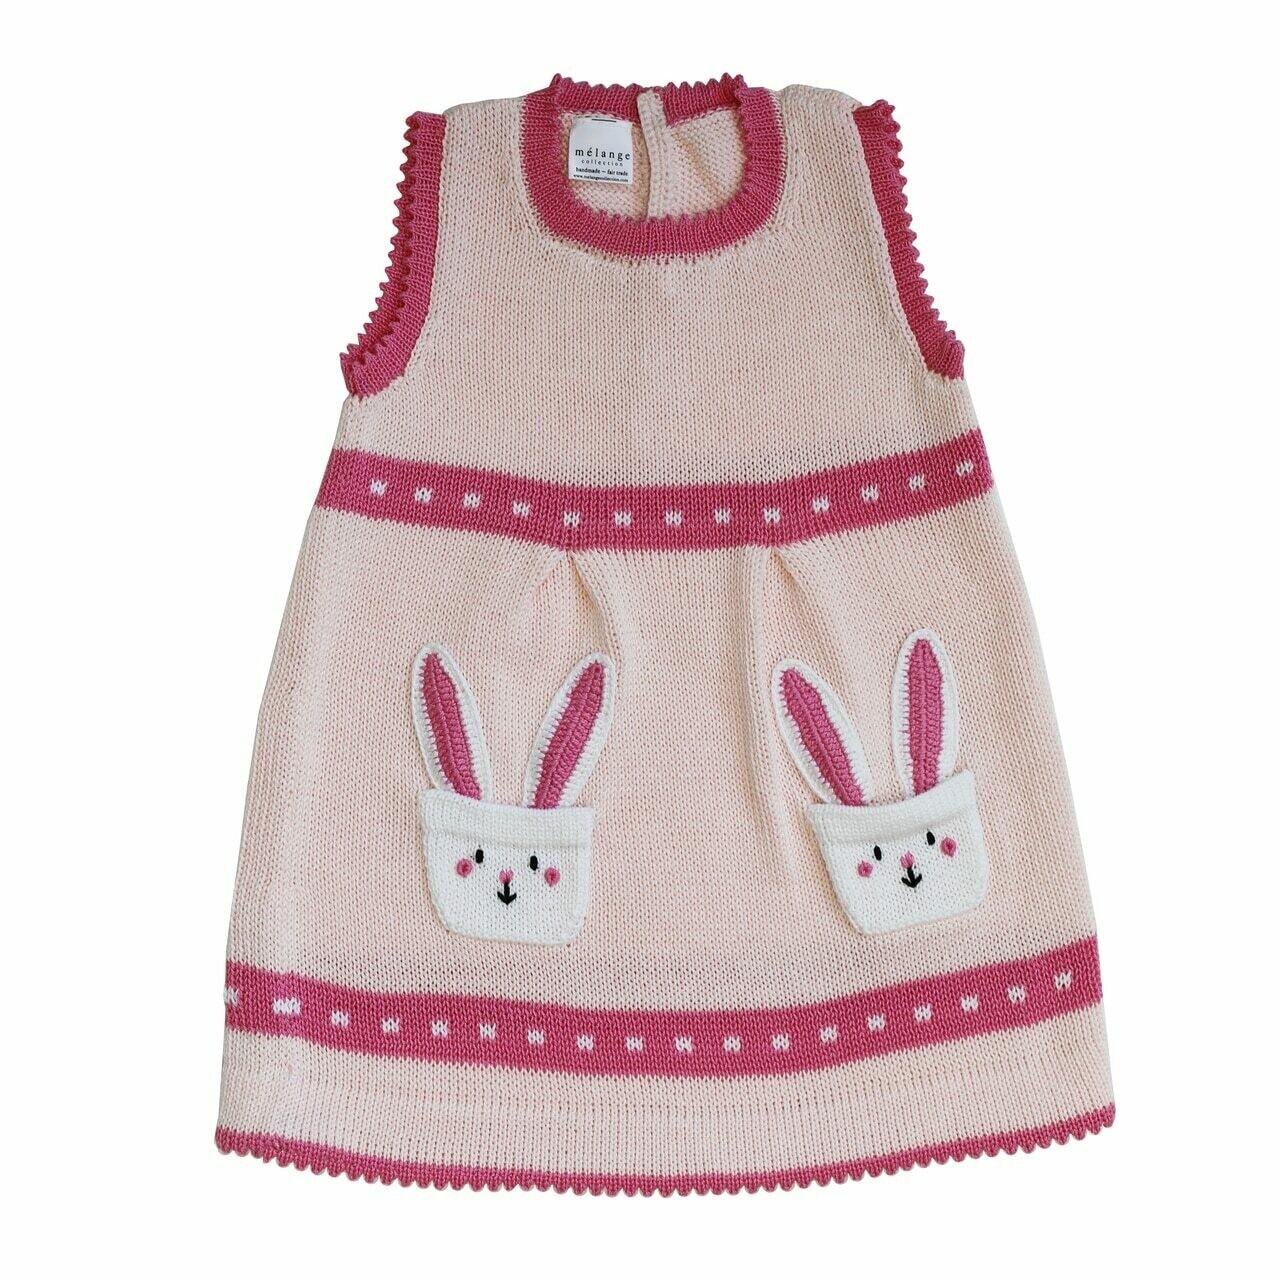 Bunny Pocket Dress, 18mon